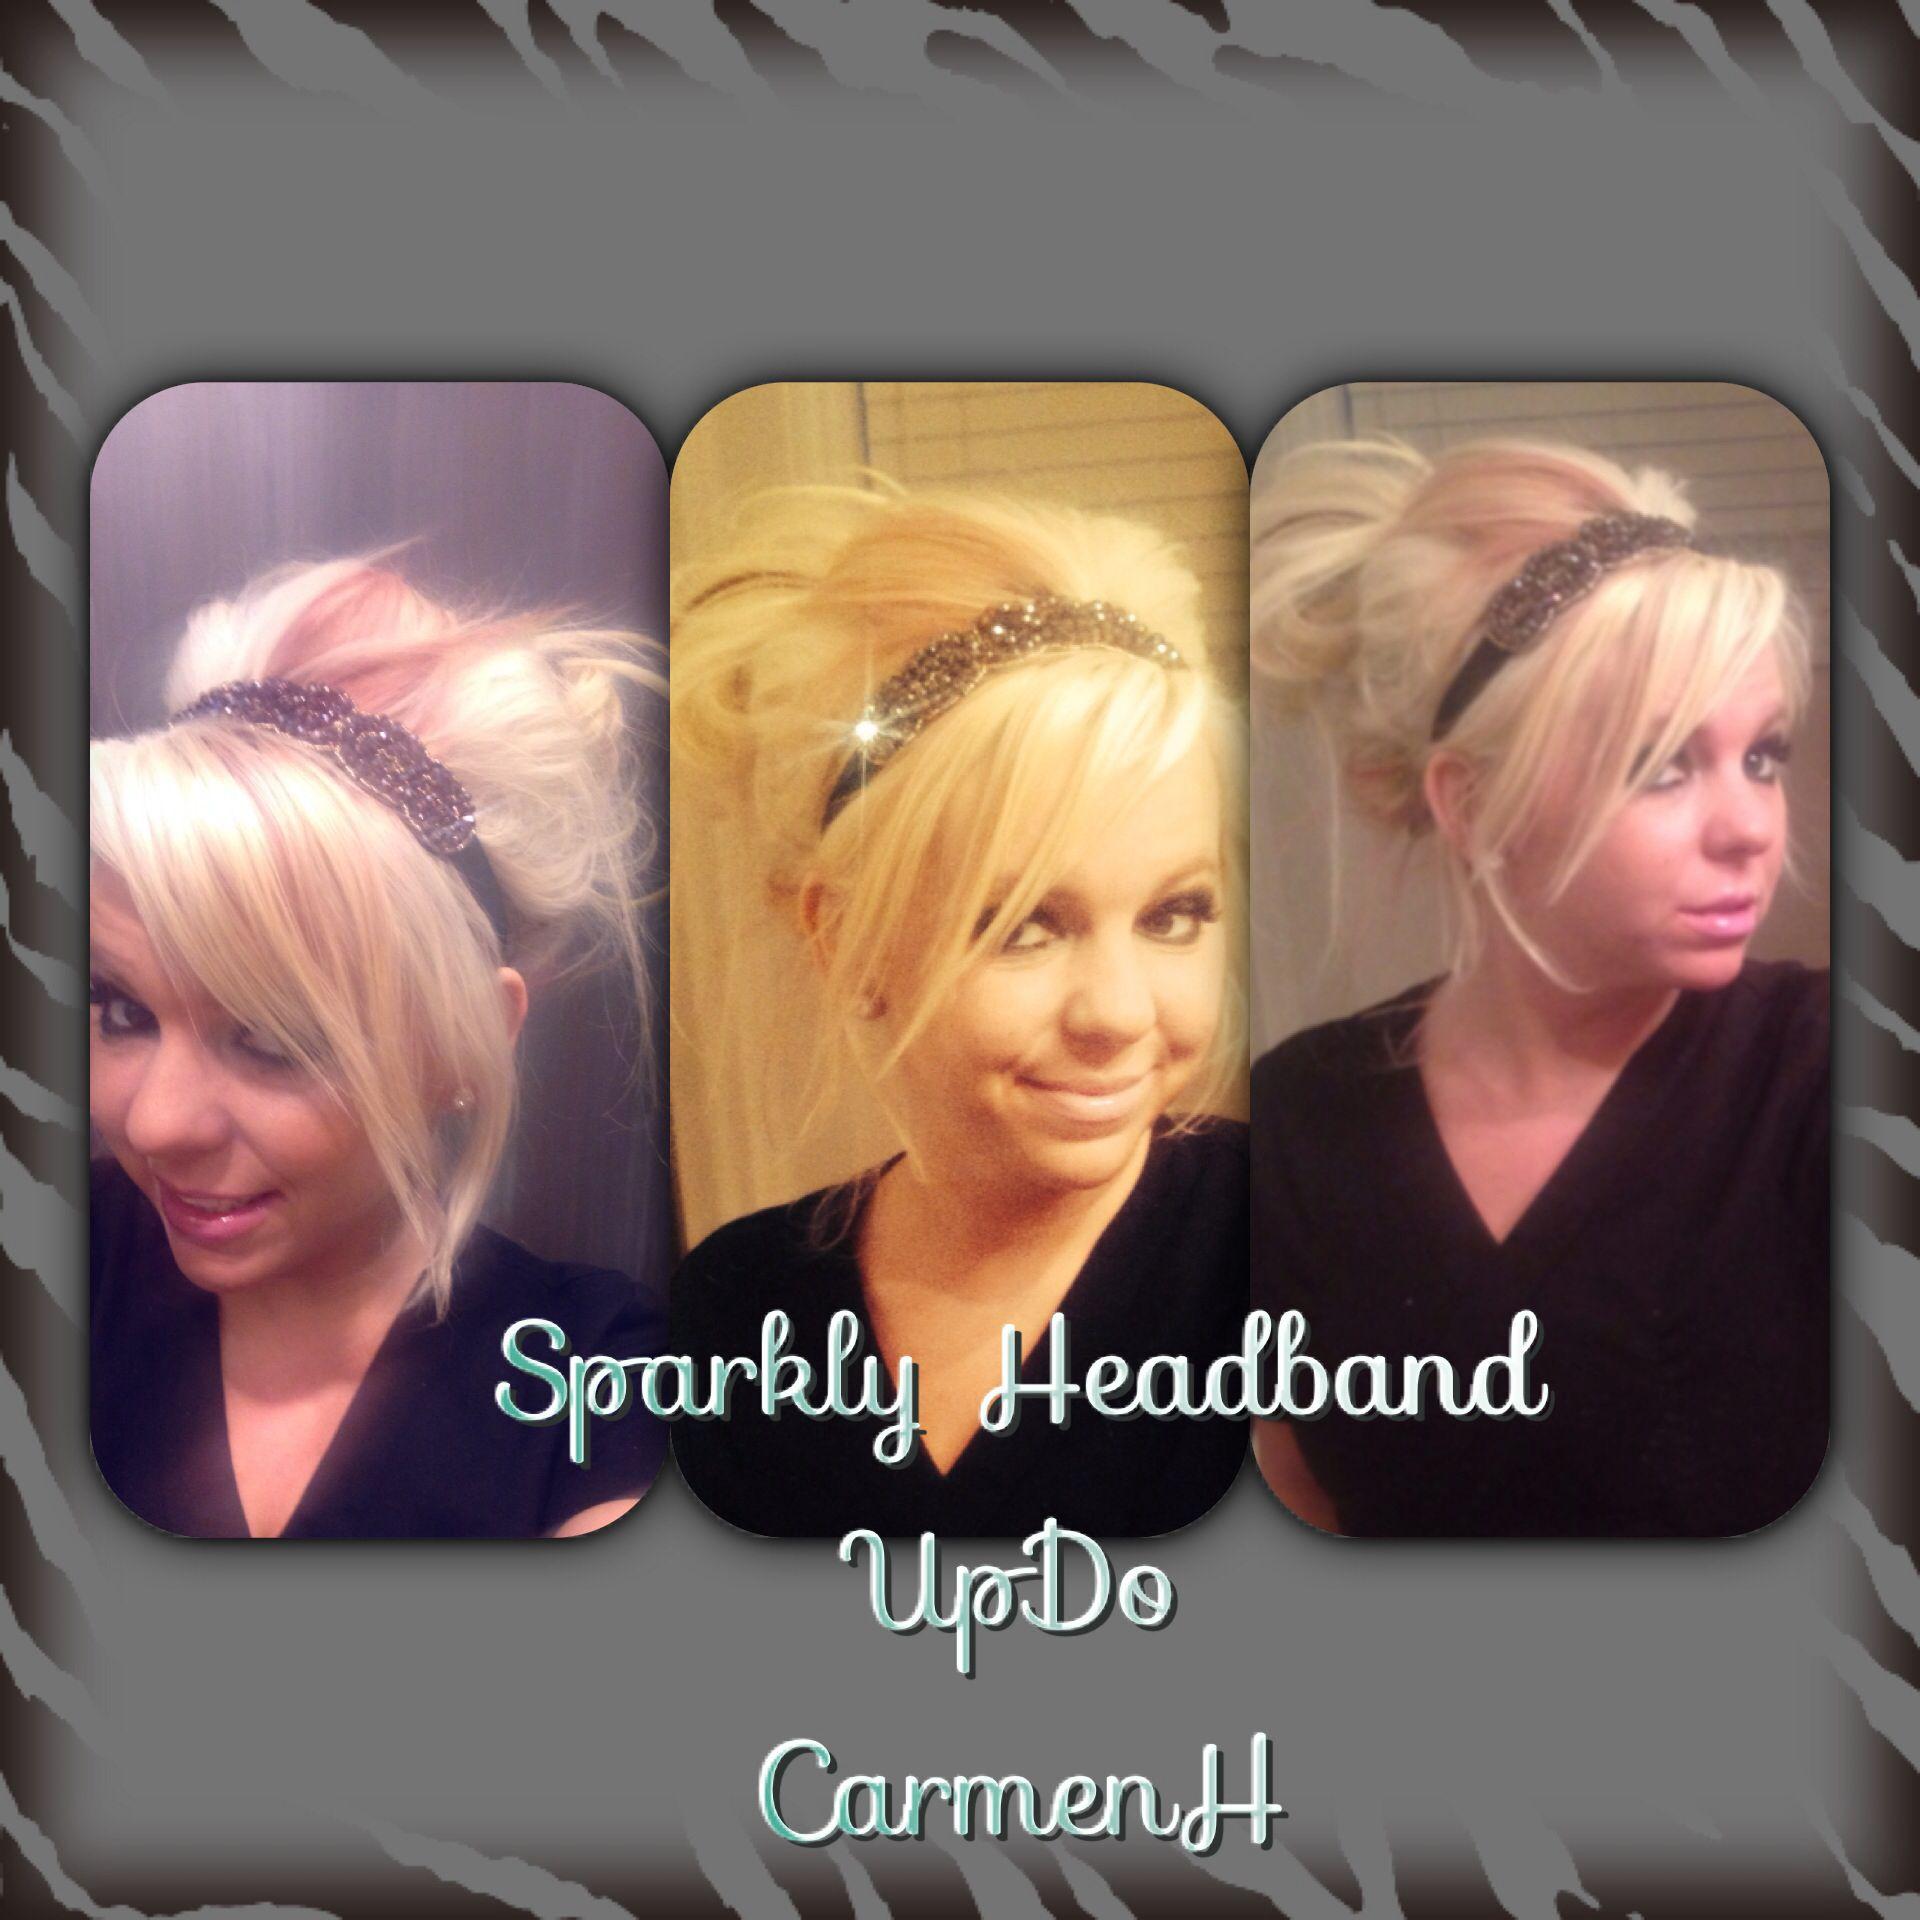 Pin by Tiffany Turner on Oooooh cute hair     Nurse hairstyles ...